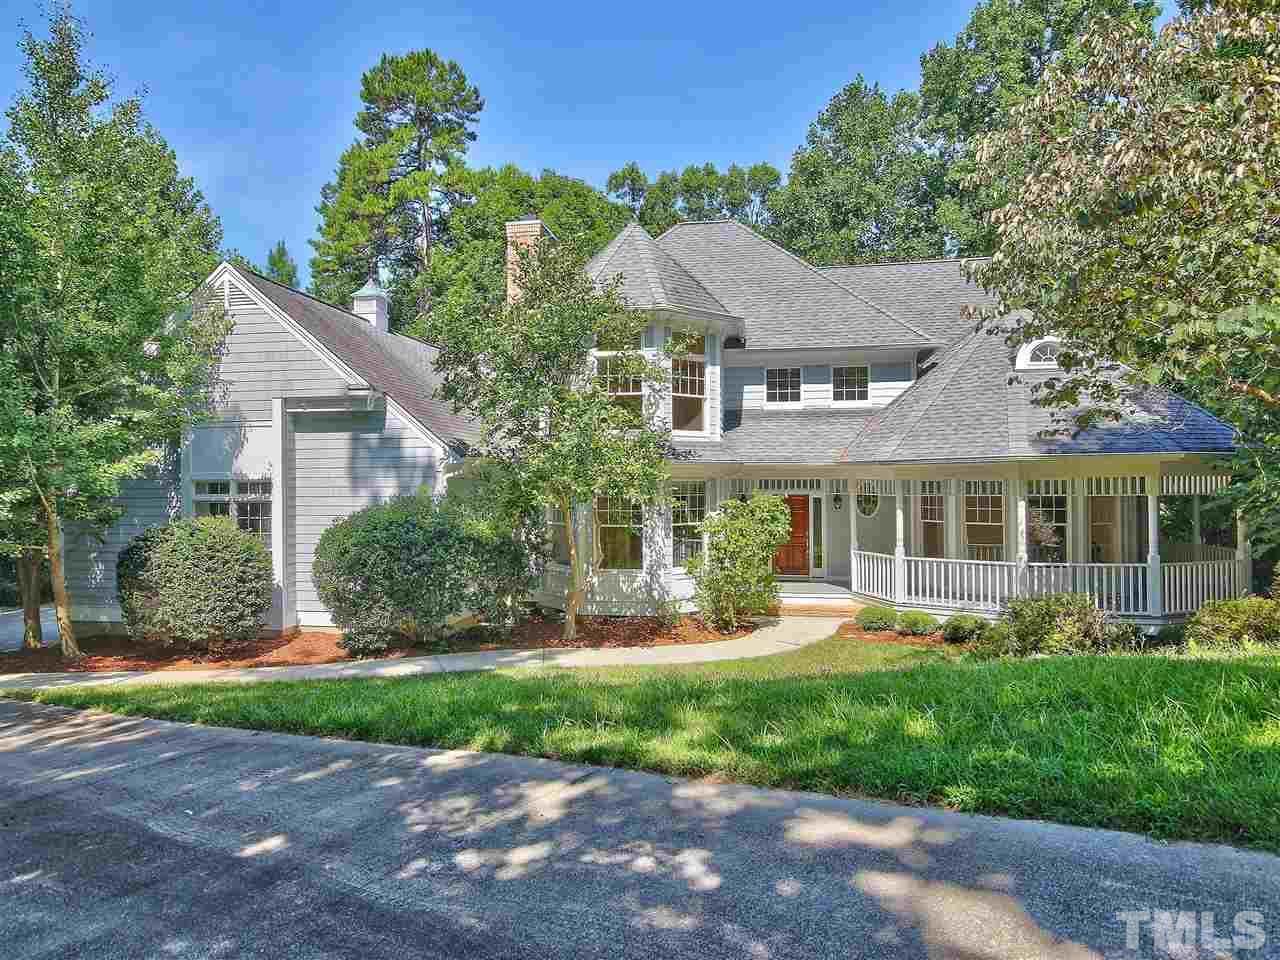 90001 Hoey, Chapel Hill, NC